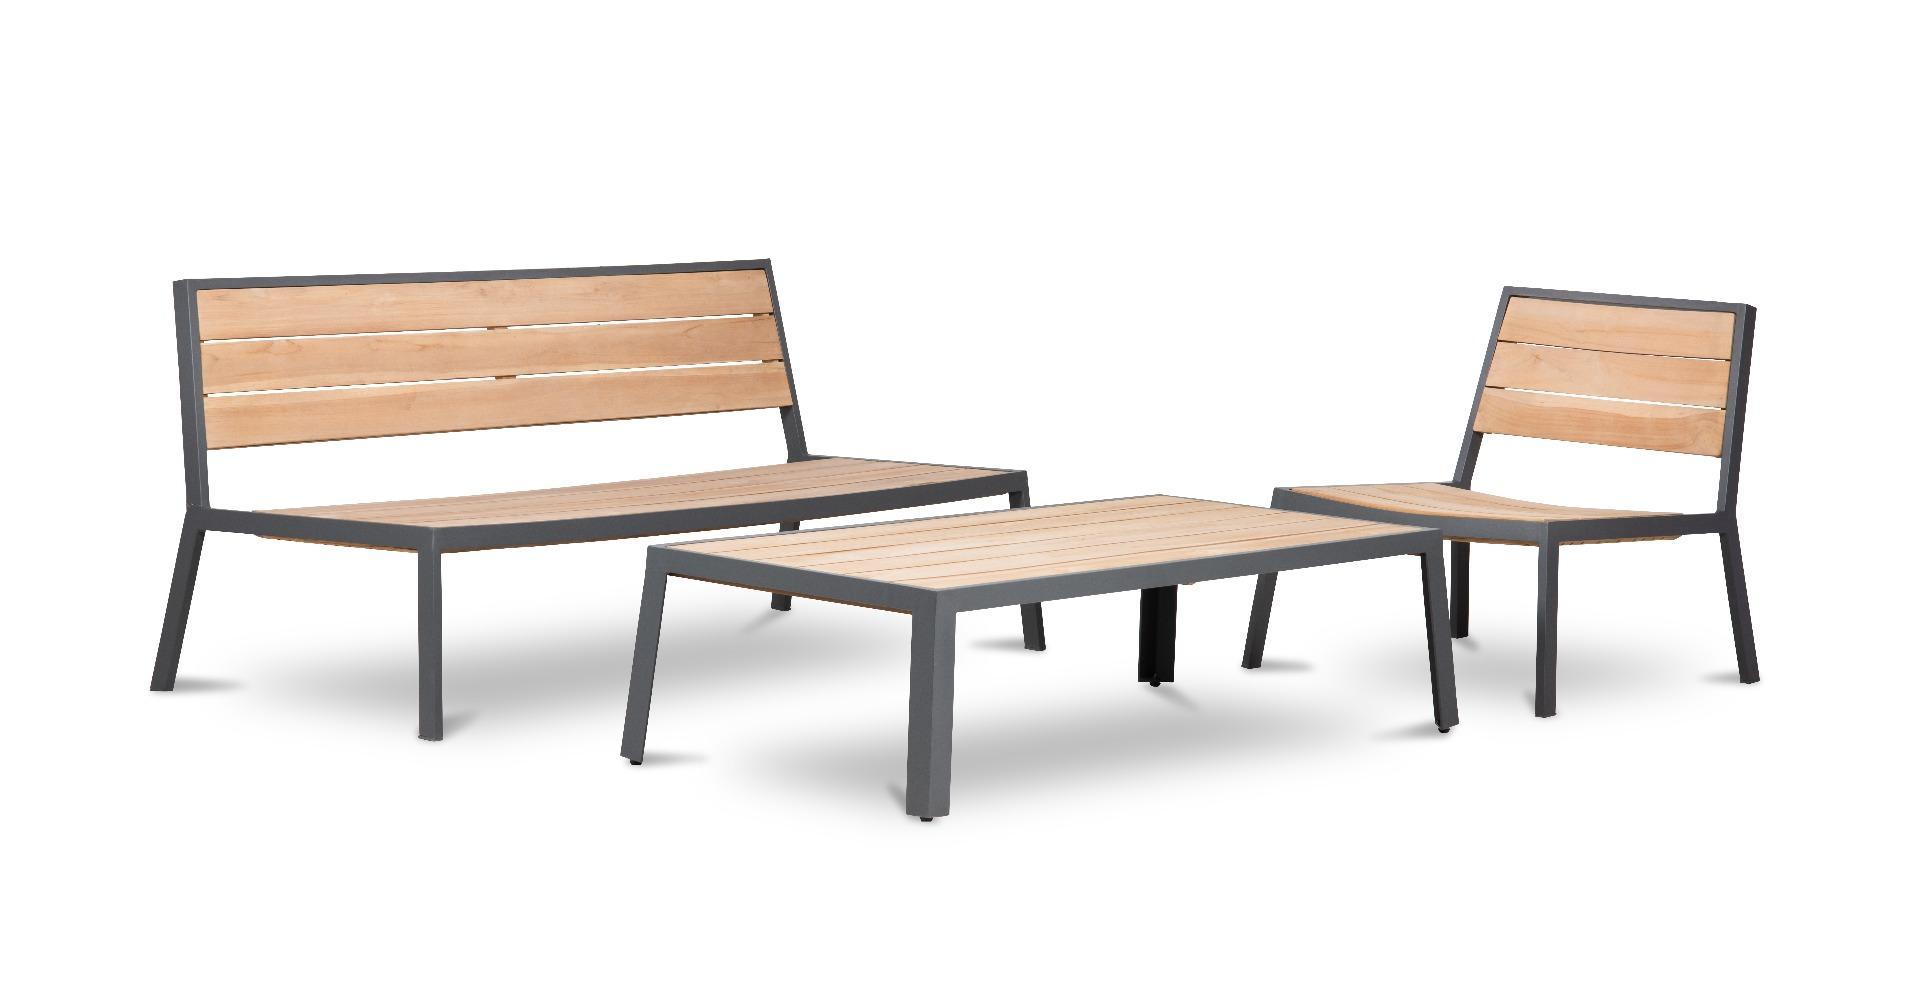 Korting Sant miguel lounge set 4pcs (2x chair bench lounge table 139x66x37cm)